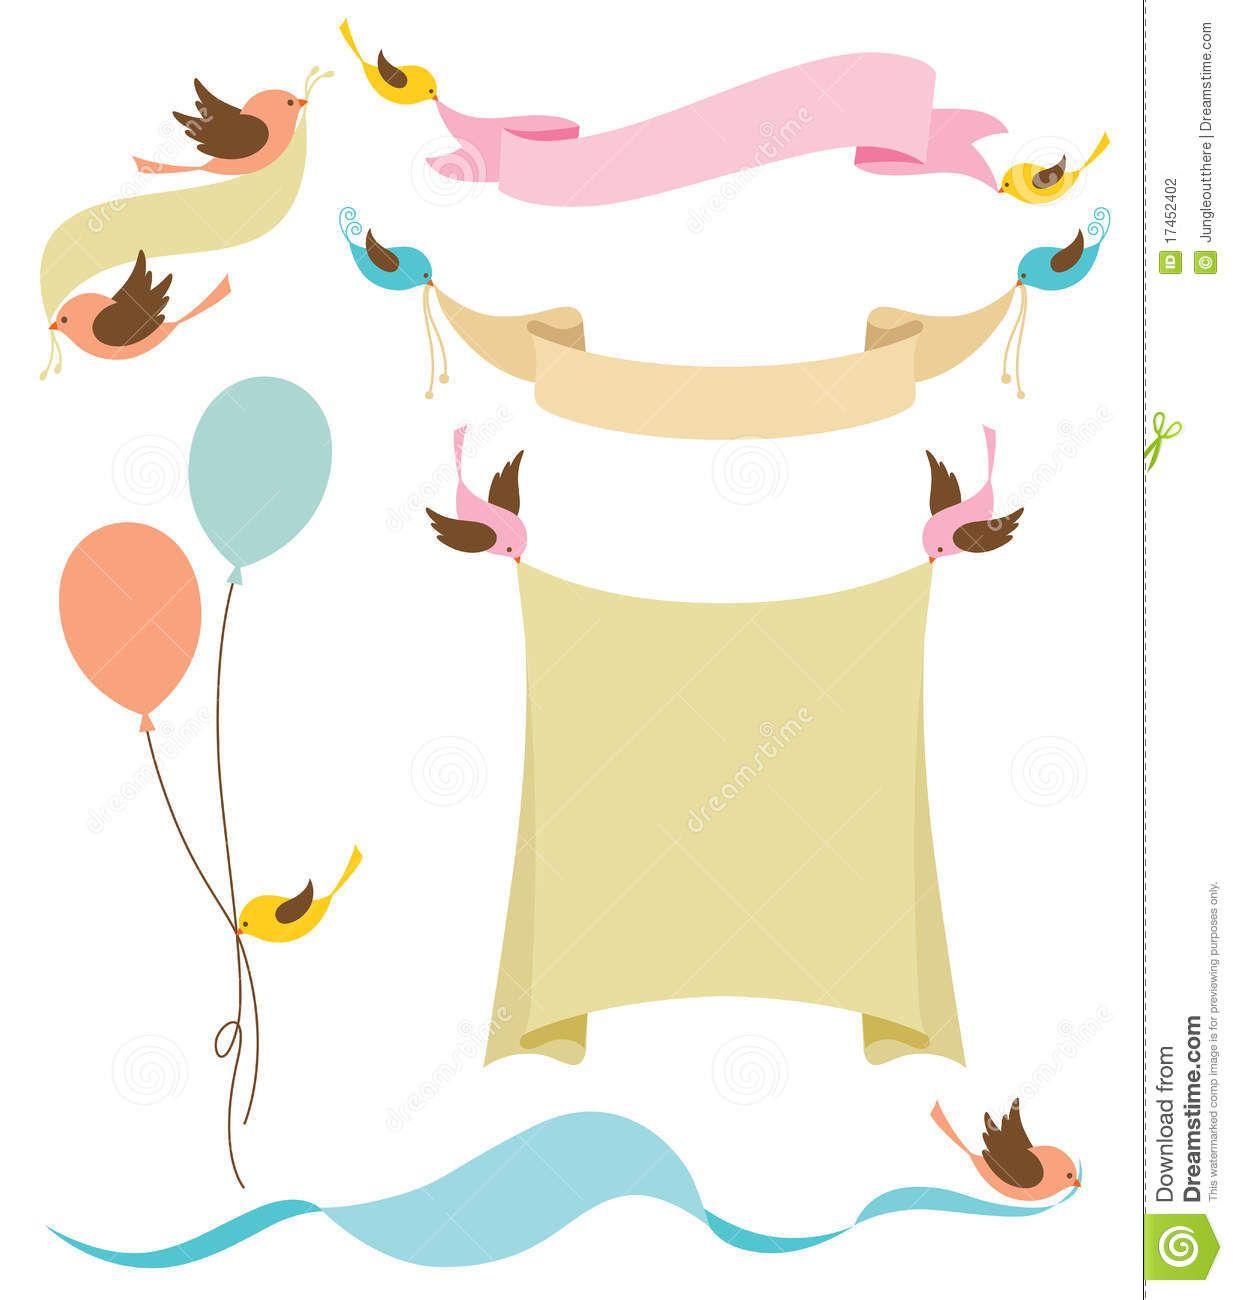 Birds Holding Banners Kate Spade Shower Illustration